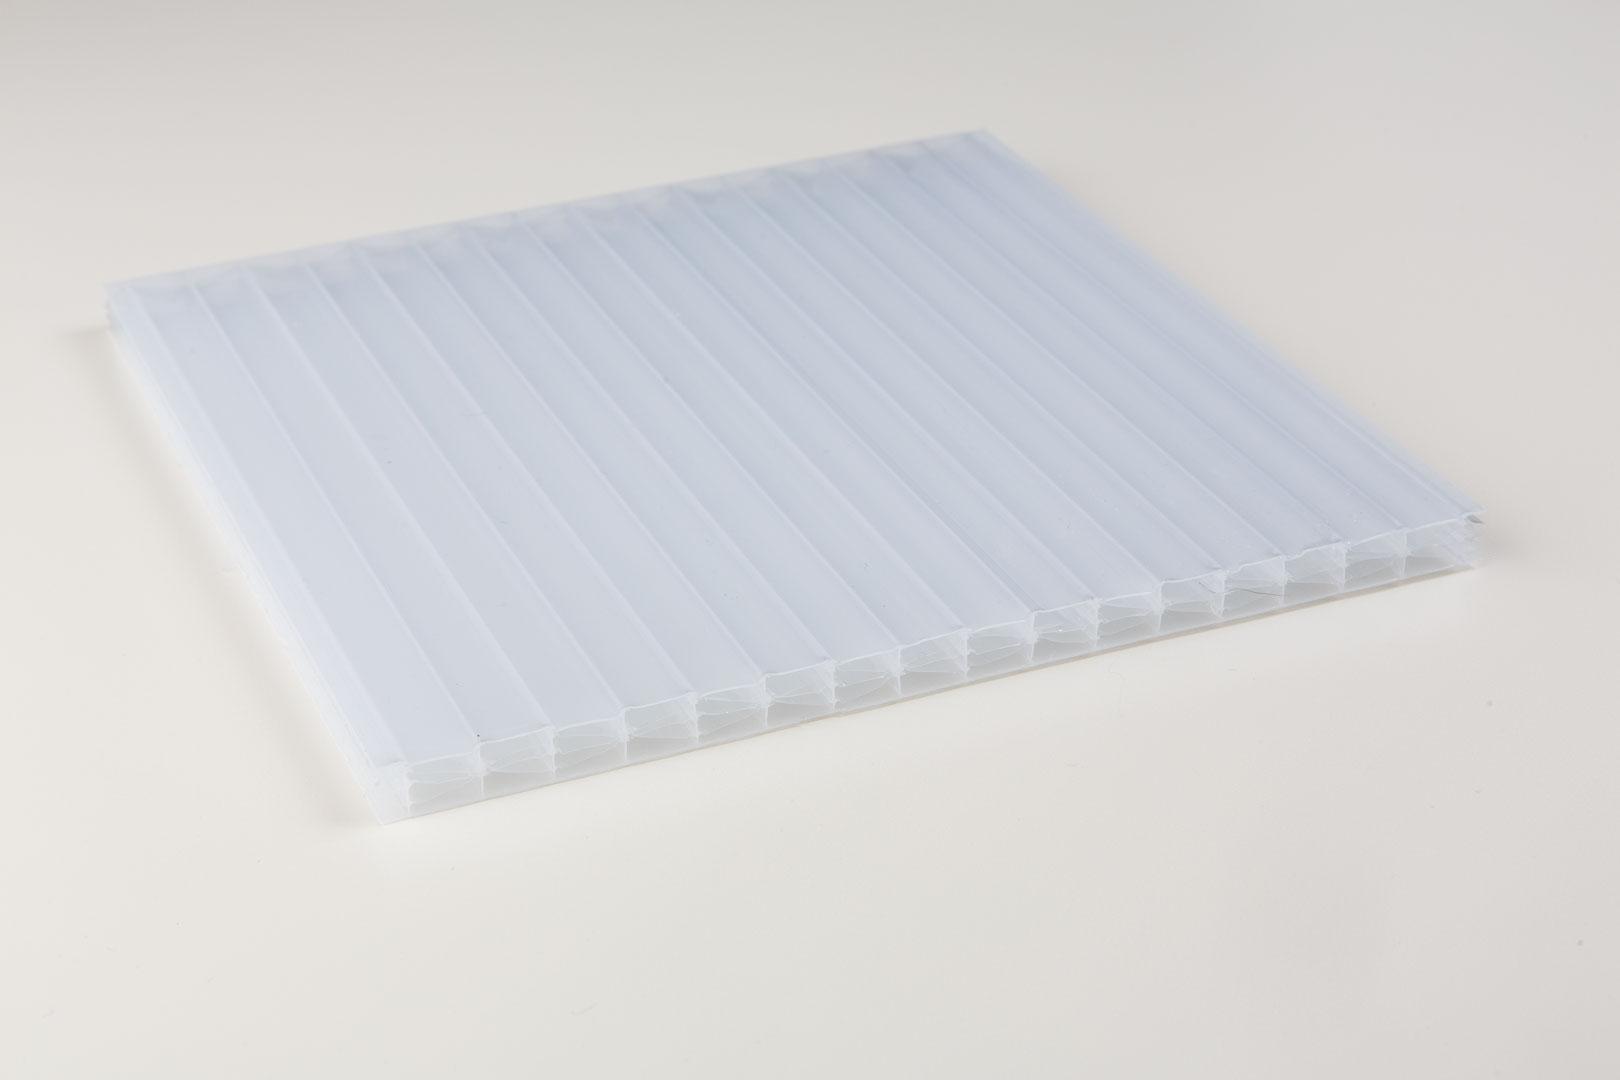 polycarbonat 10mm stegplatte opal einfach online bestellen. Black Bedroom Furniture Sets. Home Design Ideas